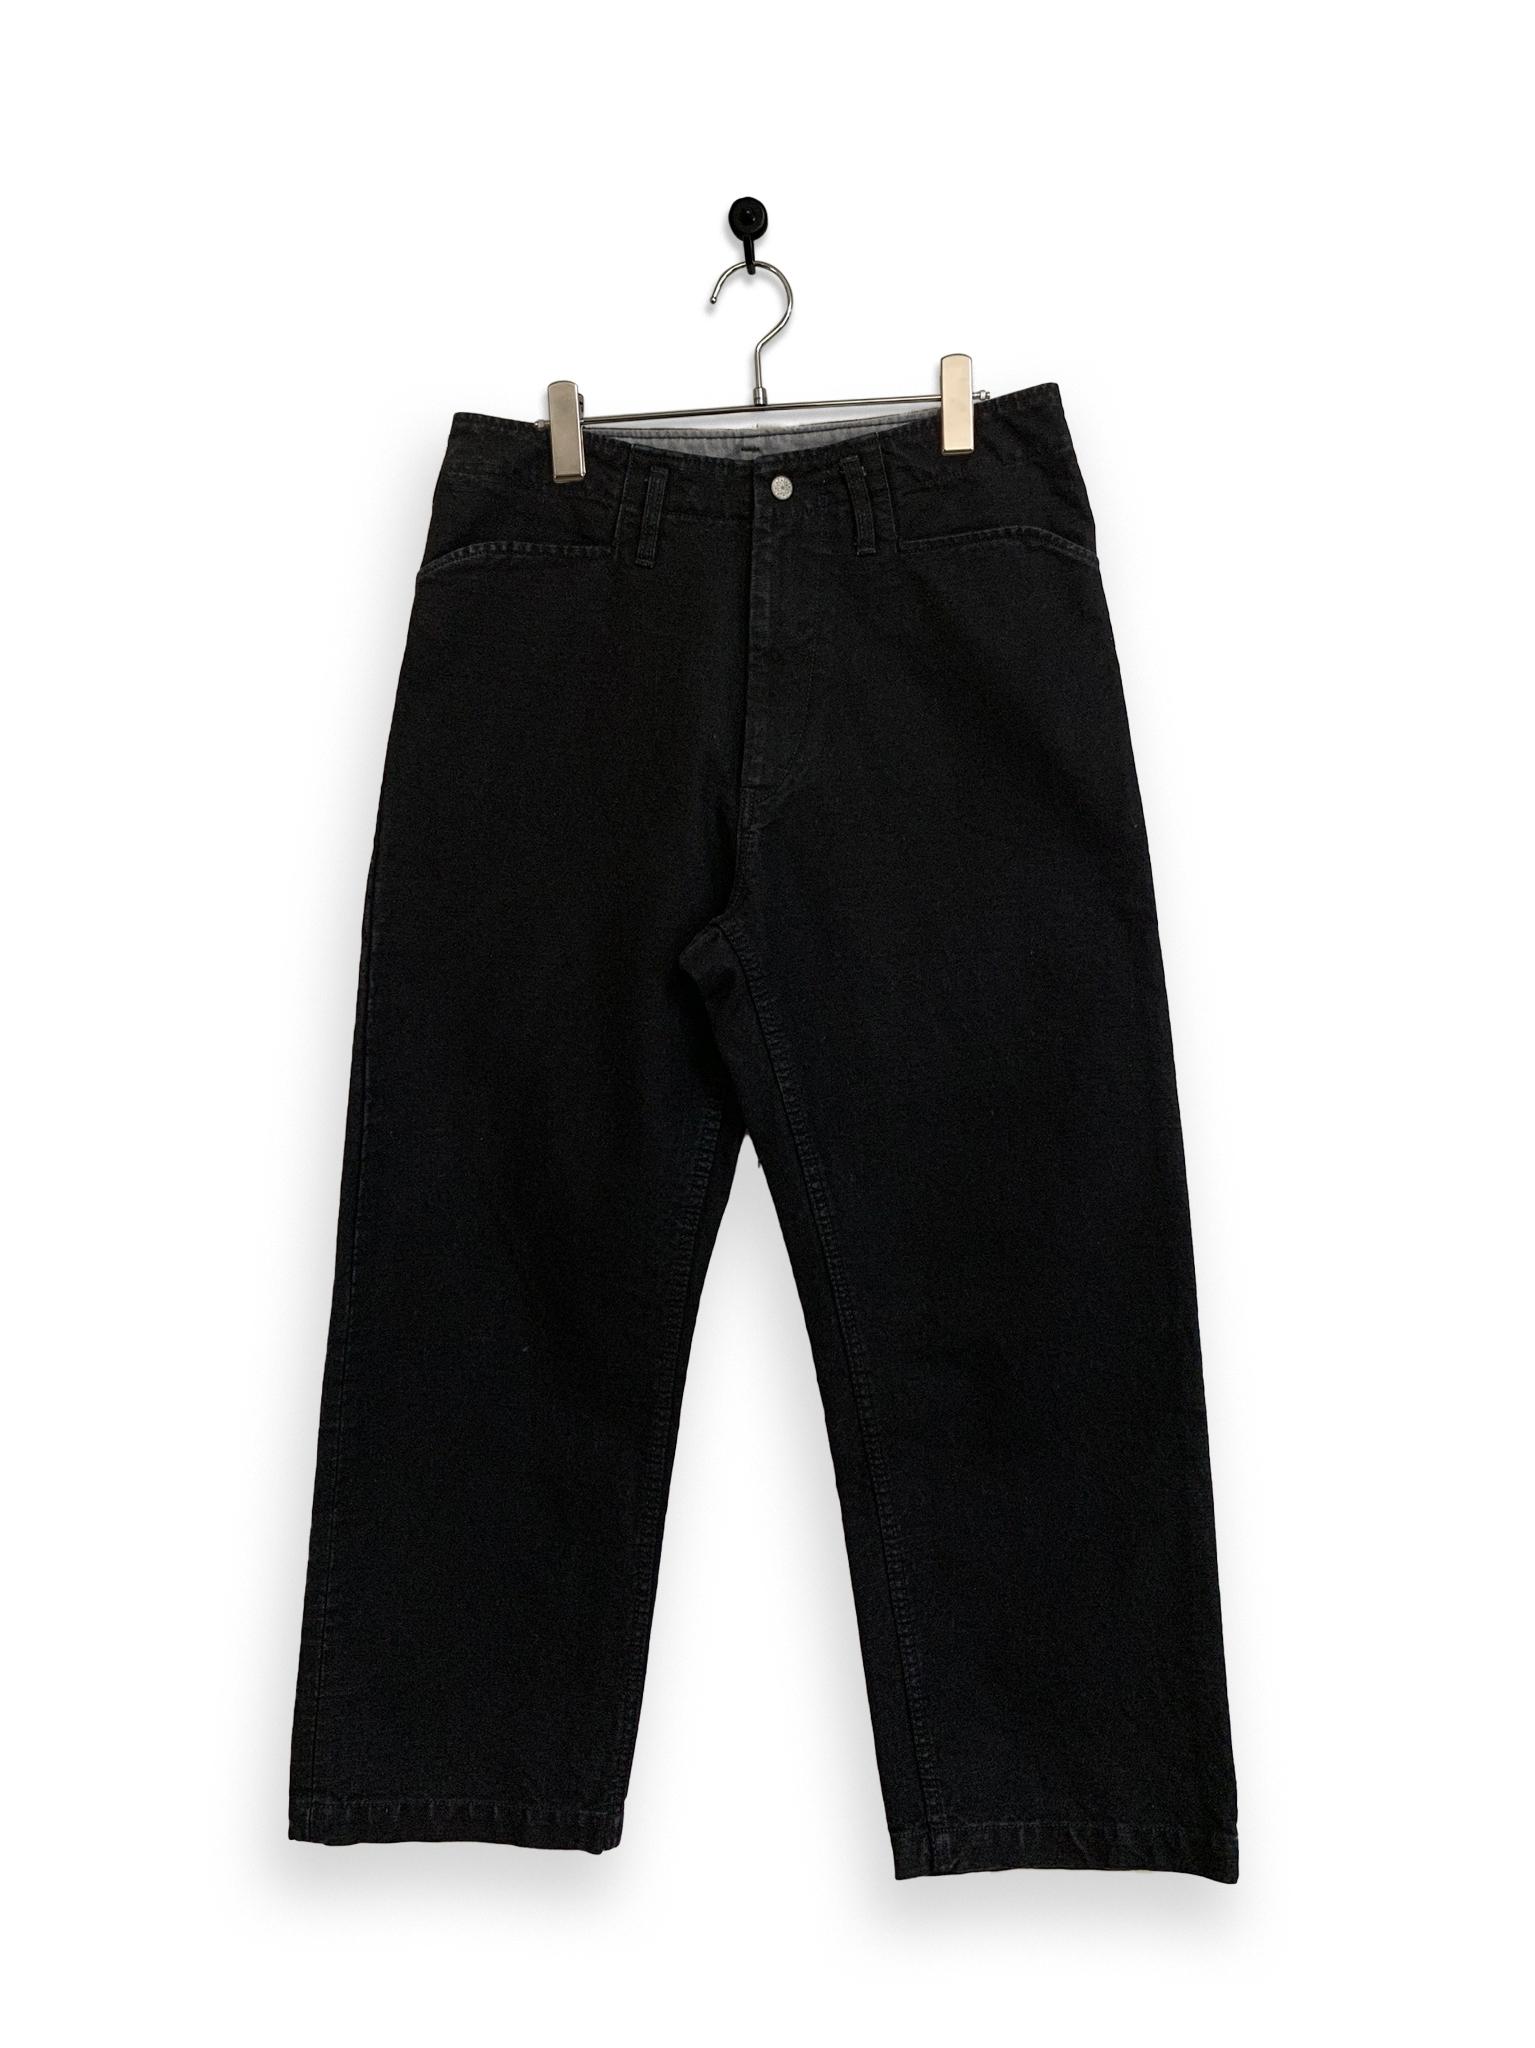 13.5oz Canvas Frisco Pants / garment dyed / black